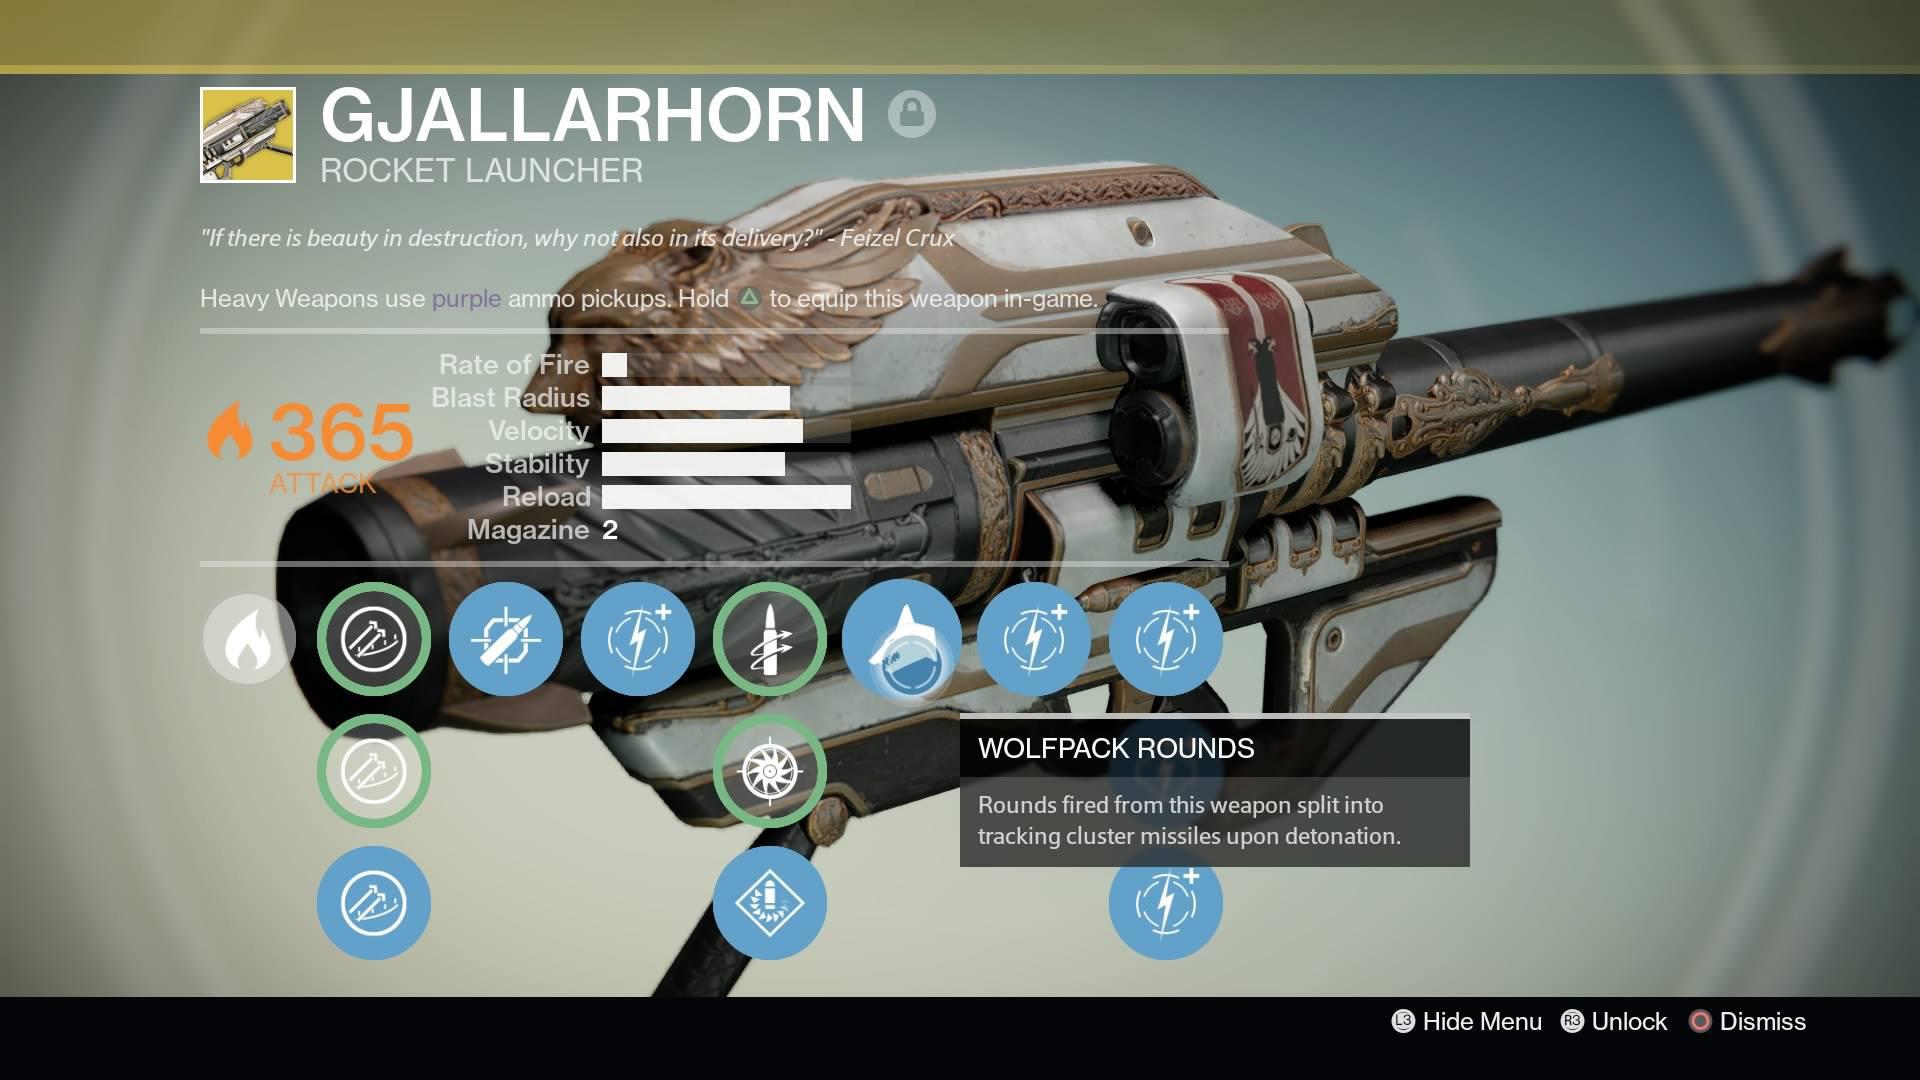 Destiny - Gjallarhorn Rocket Launcher